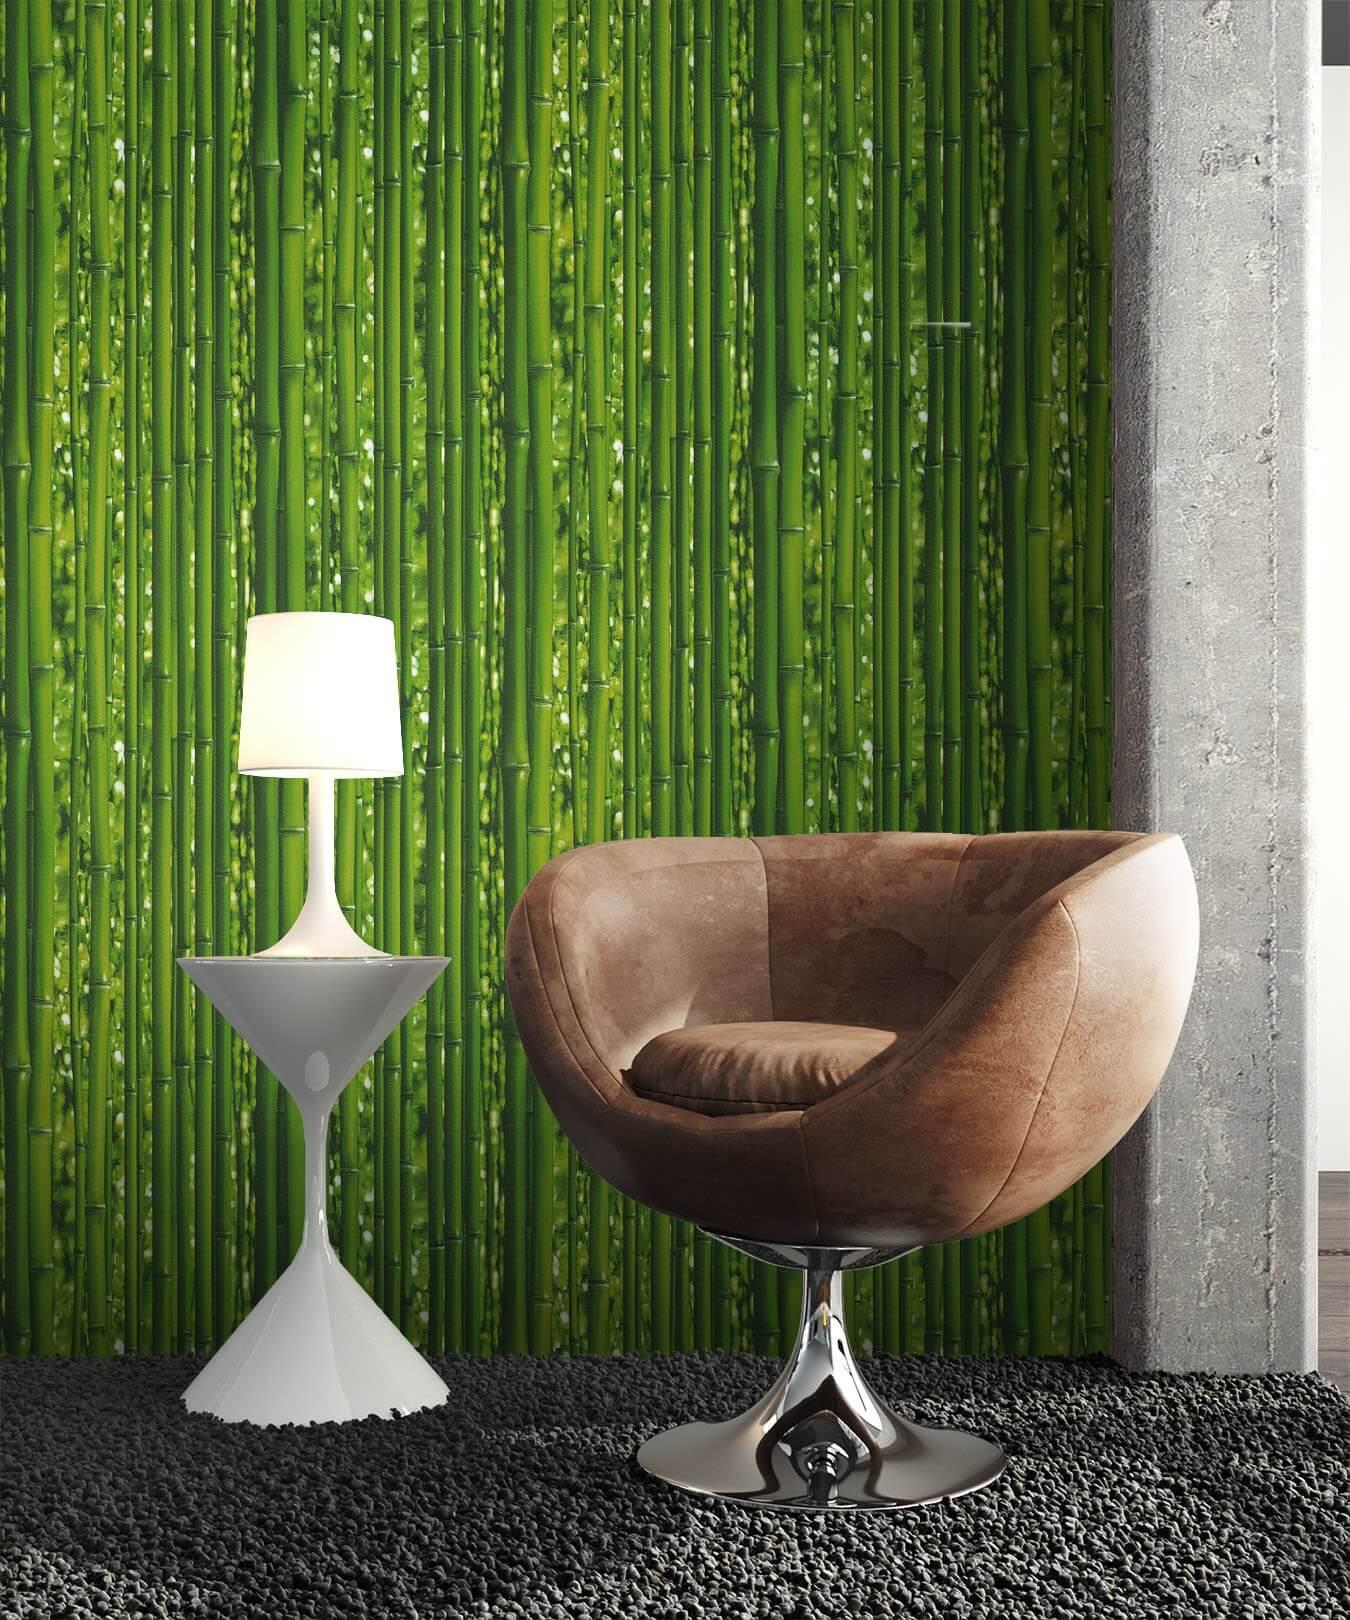 ... Tapete Grün Bambus Deko